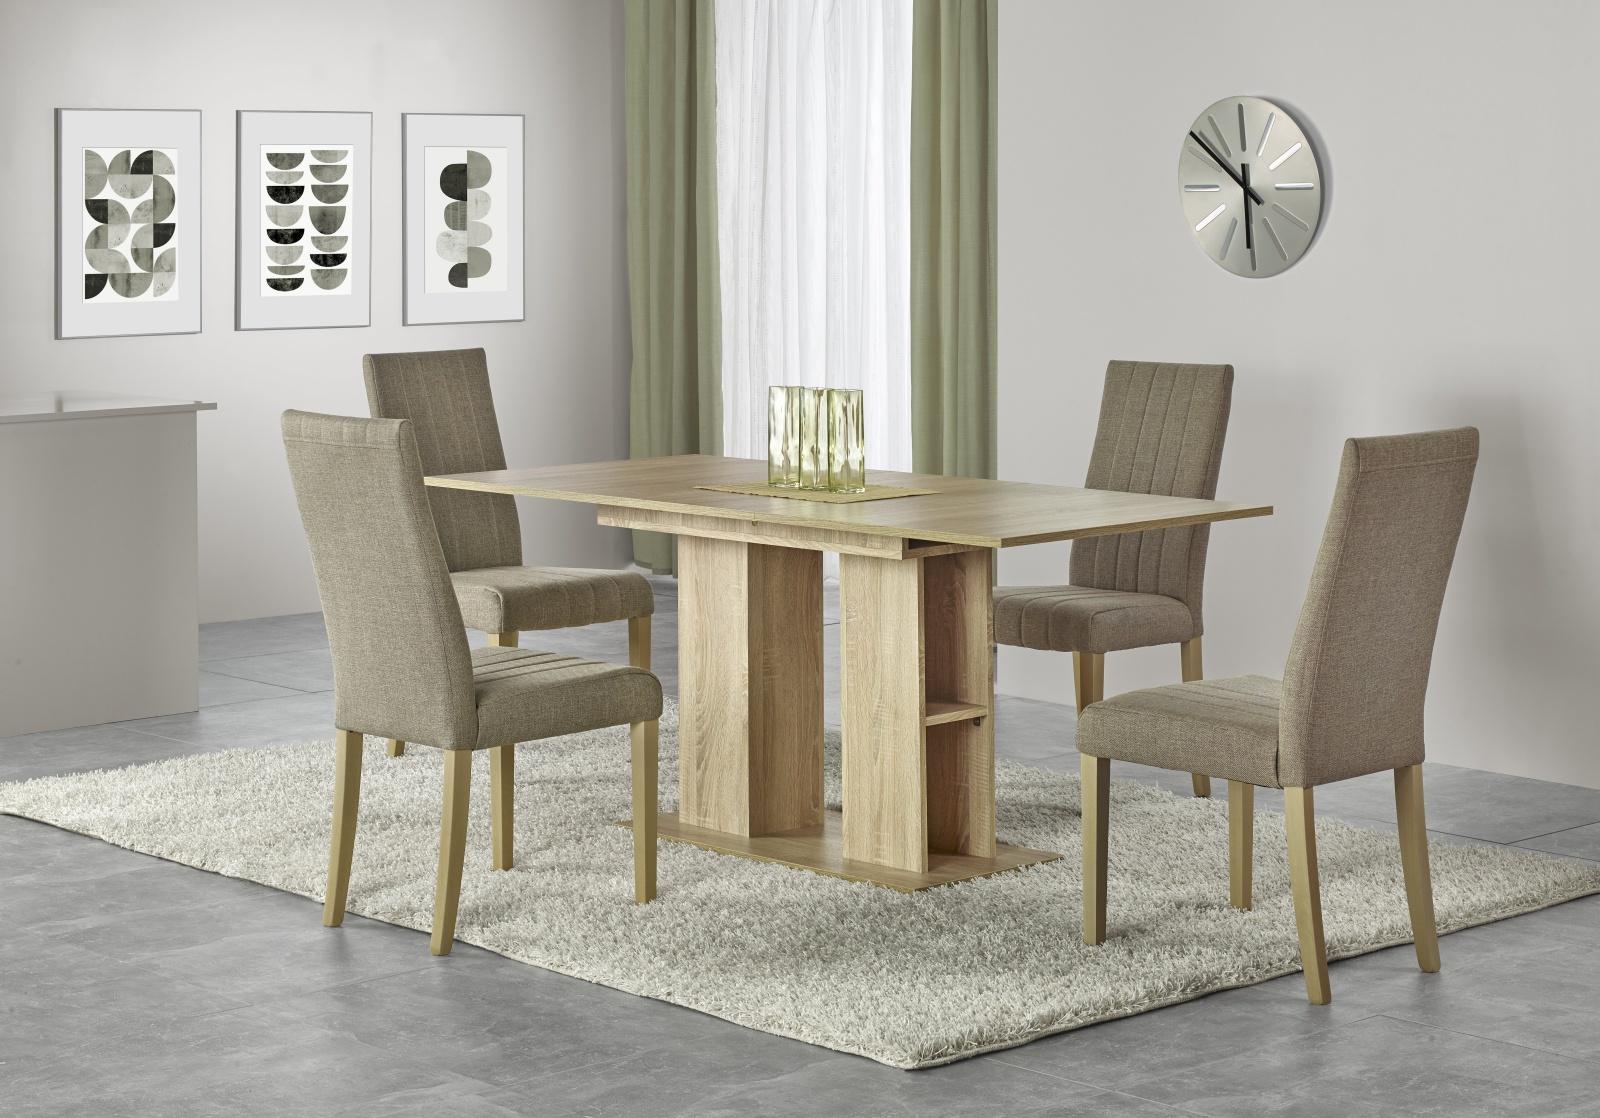 Halmar Jídelní stůl rozkládací KORNEL, 130/170x80 cm, dub sonoma